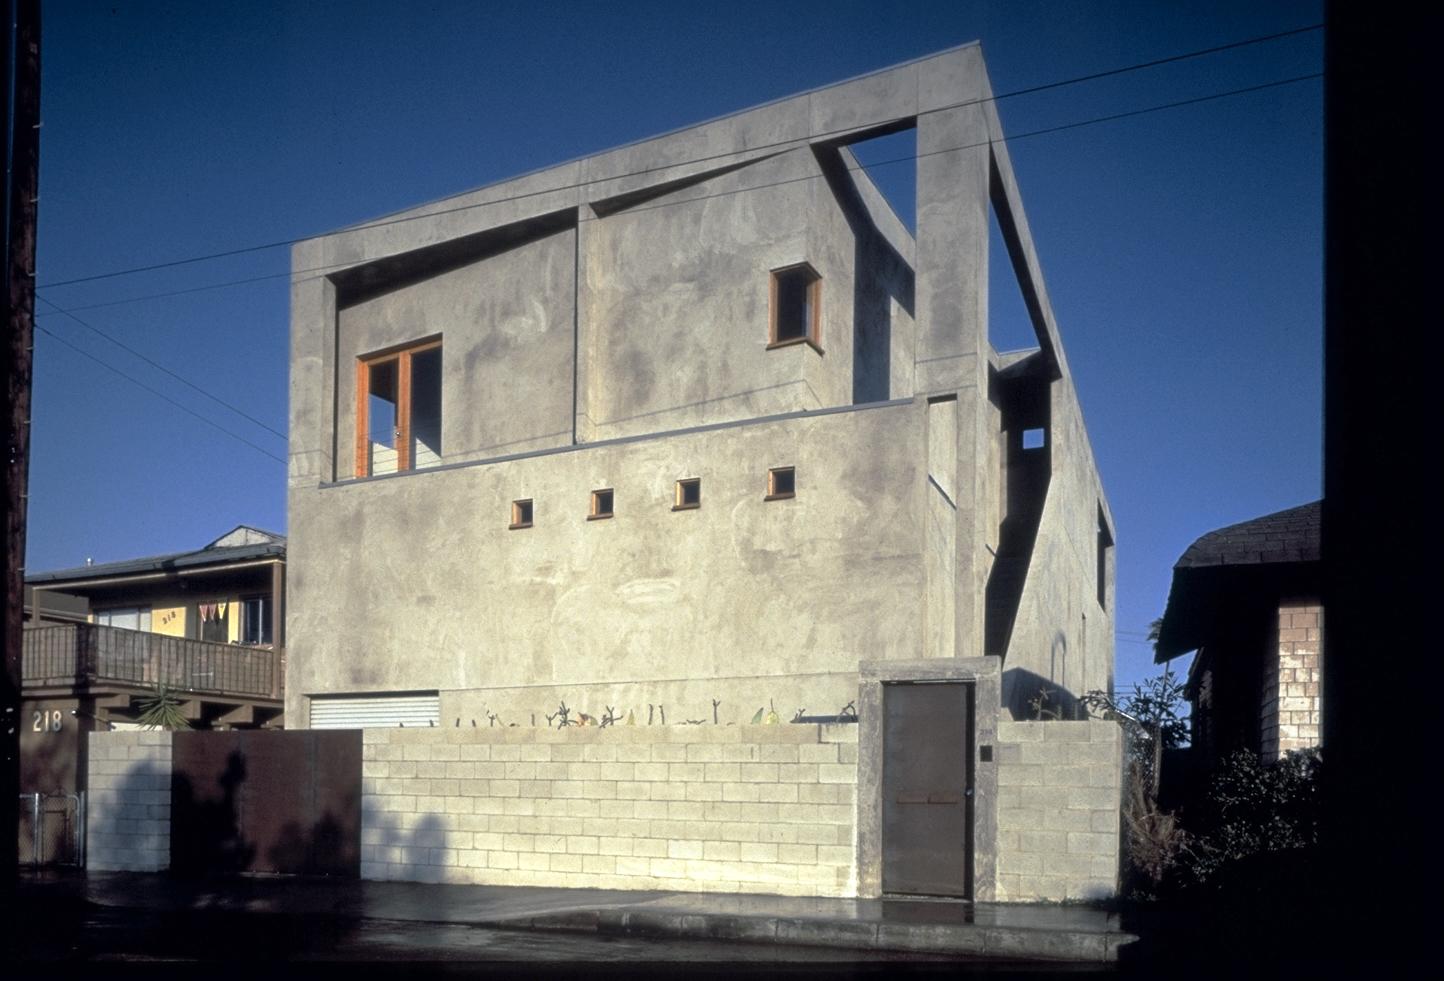 S.E.A.-Studio-Environmental-Architecture-David-Hertz-FAIA-Venable-House-Venice-Beach-sustainable-regenerative-restorative-design-residential-contemporary-modern-passive-systems-recycled-wood-concrete-green-building-canal-beachhouse-studioea-2.jpg